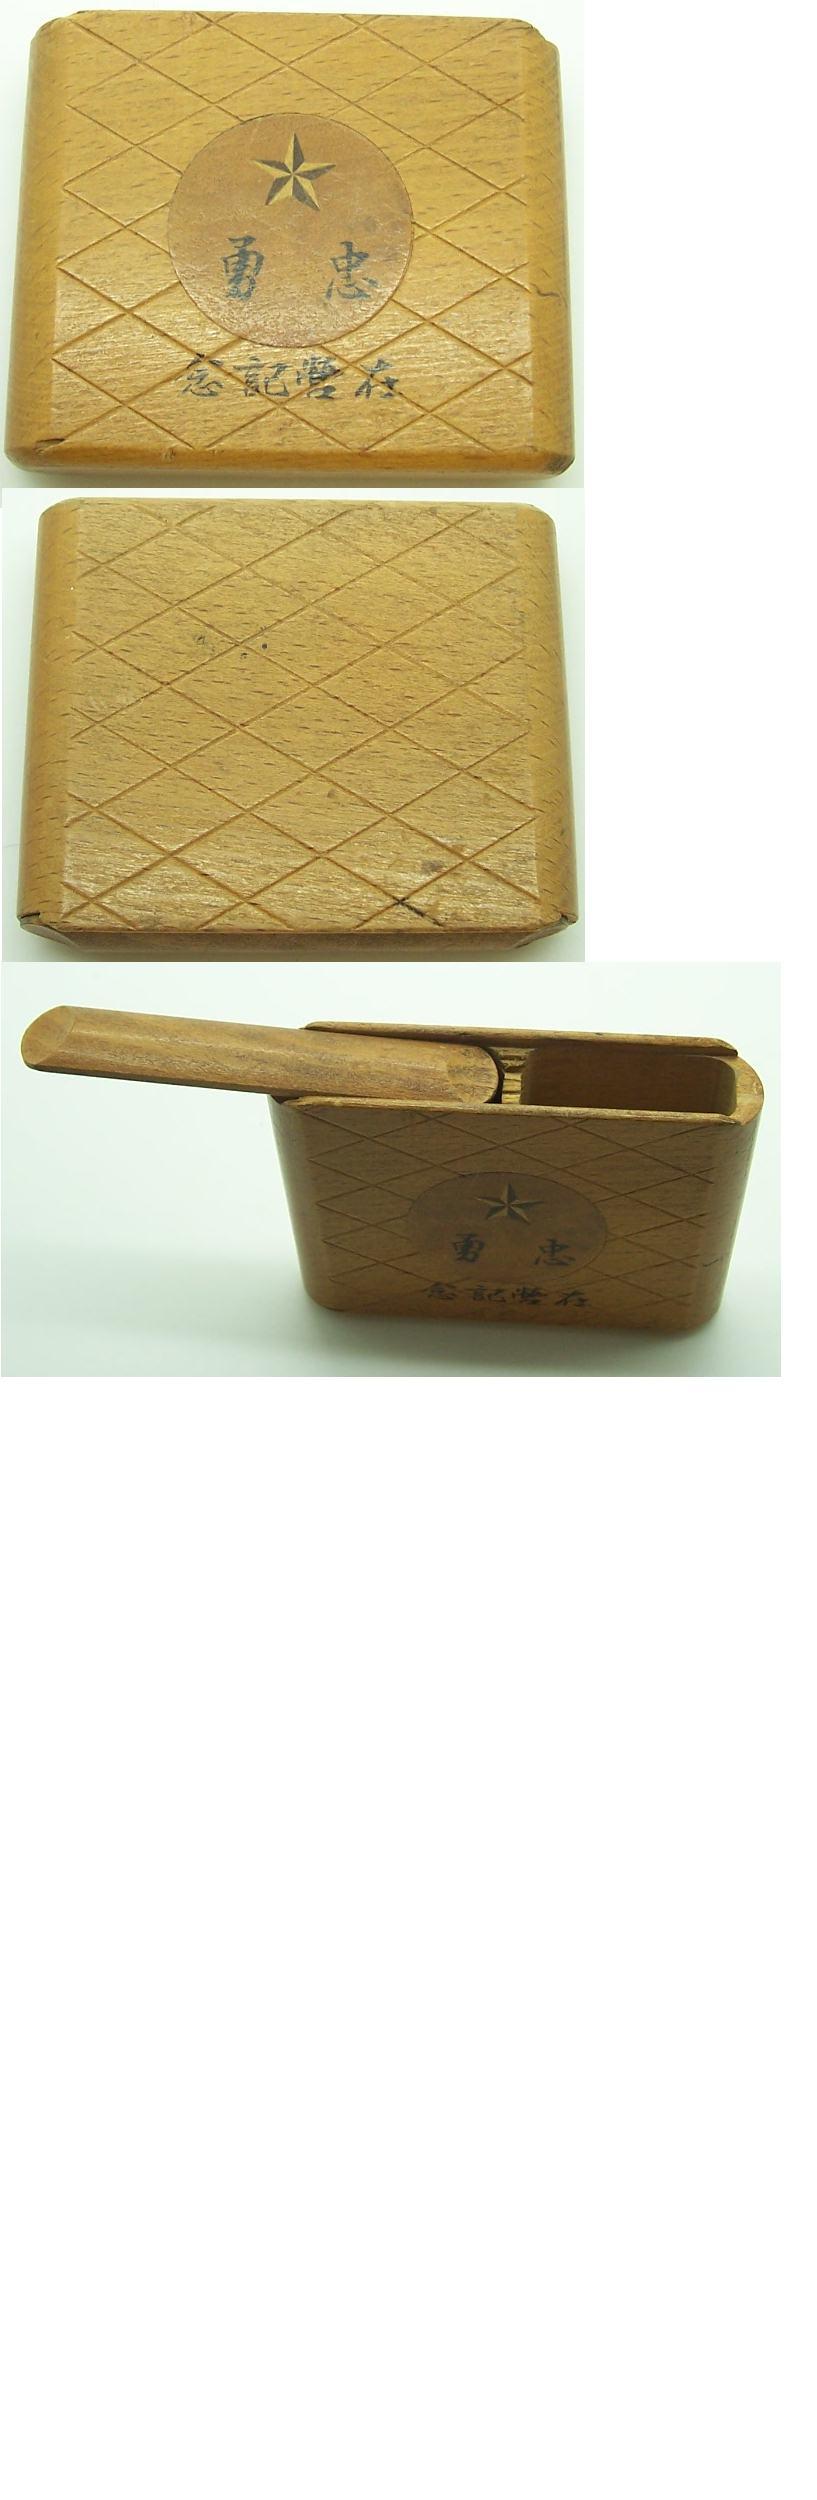 Imperial Japanese Cigarette Case